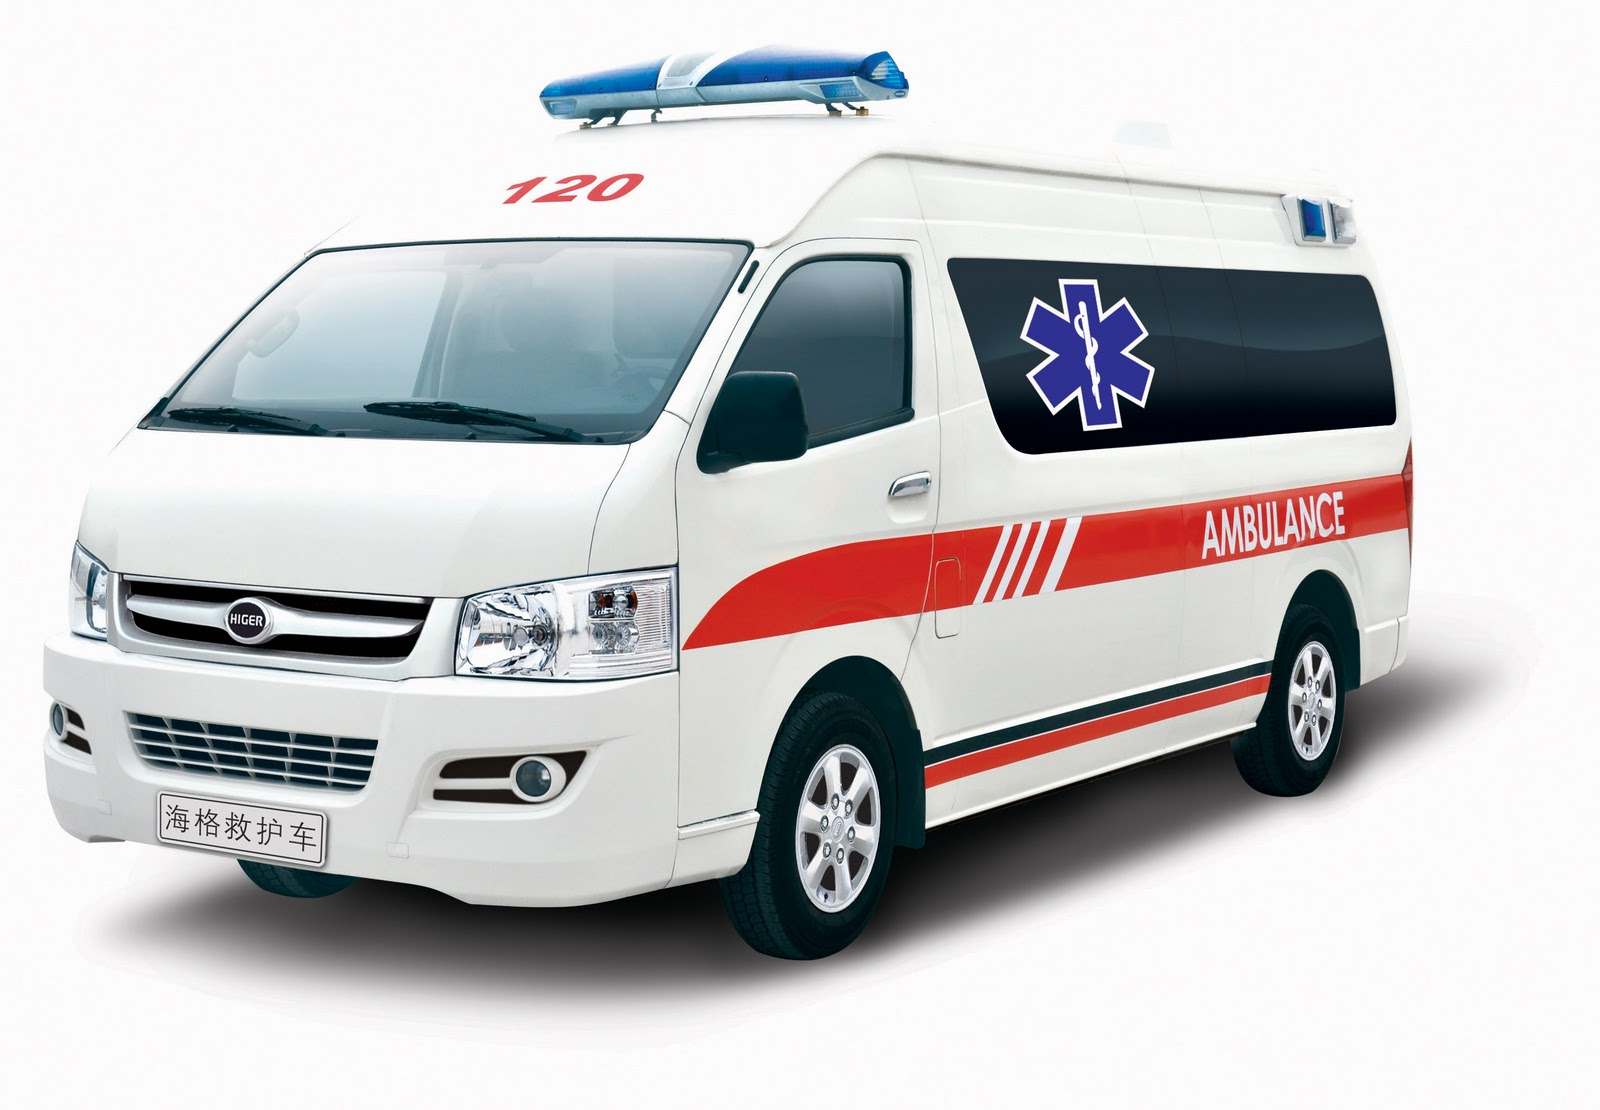 Ambulance PNG - 17476